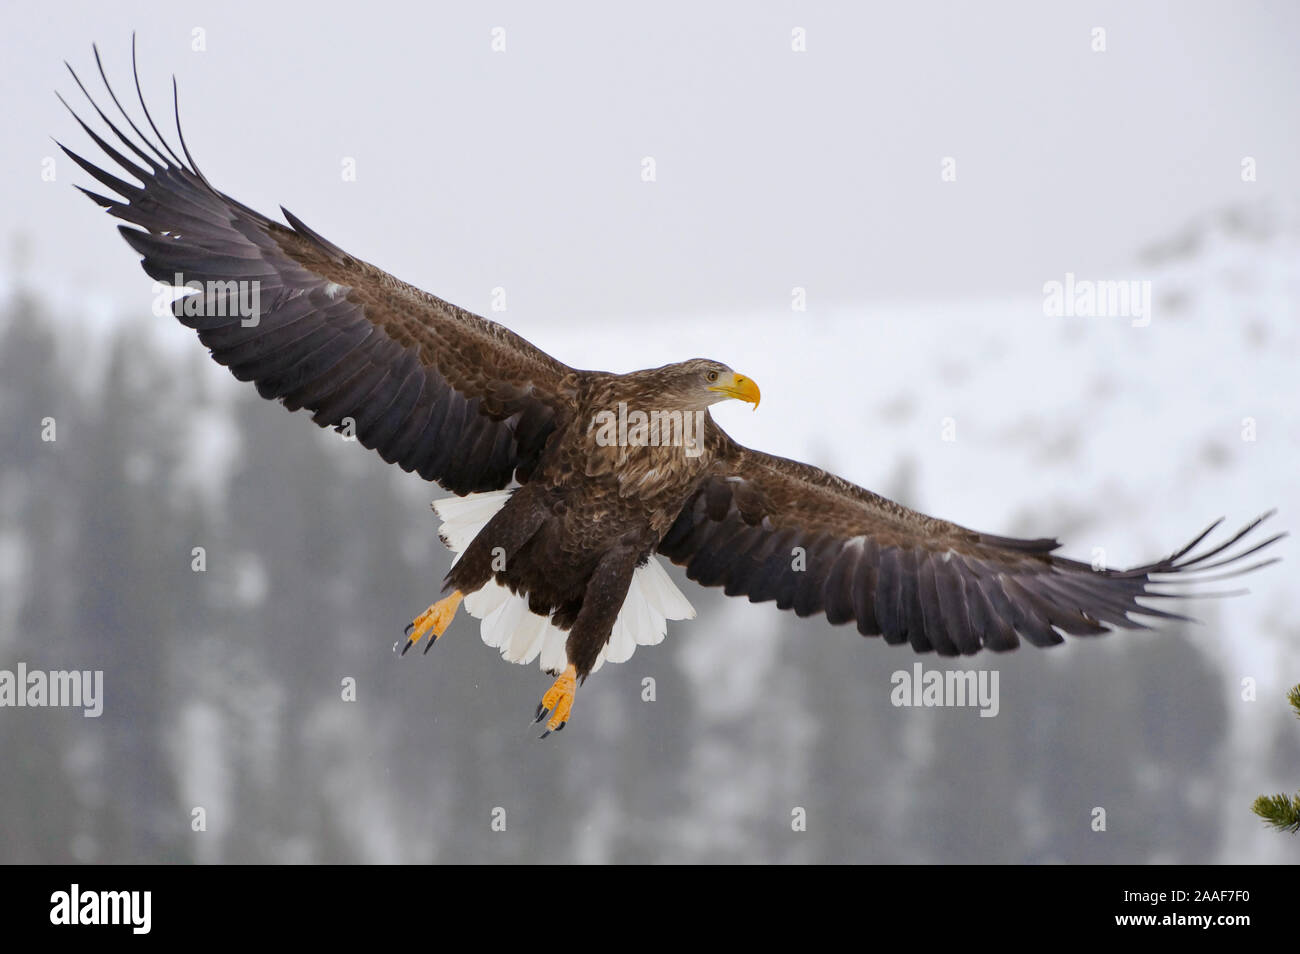 Adler, Greifvogel, Haliaeetus albicilla, white-tailed sea eagle, Winter Stock Photo